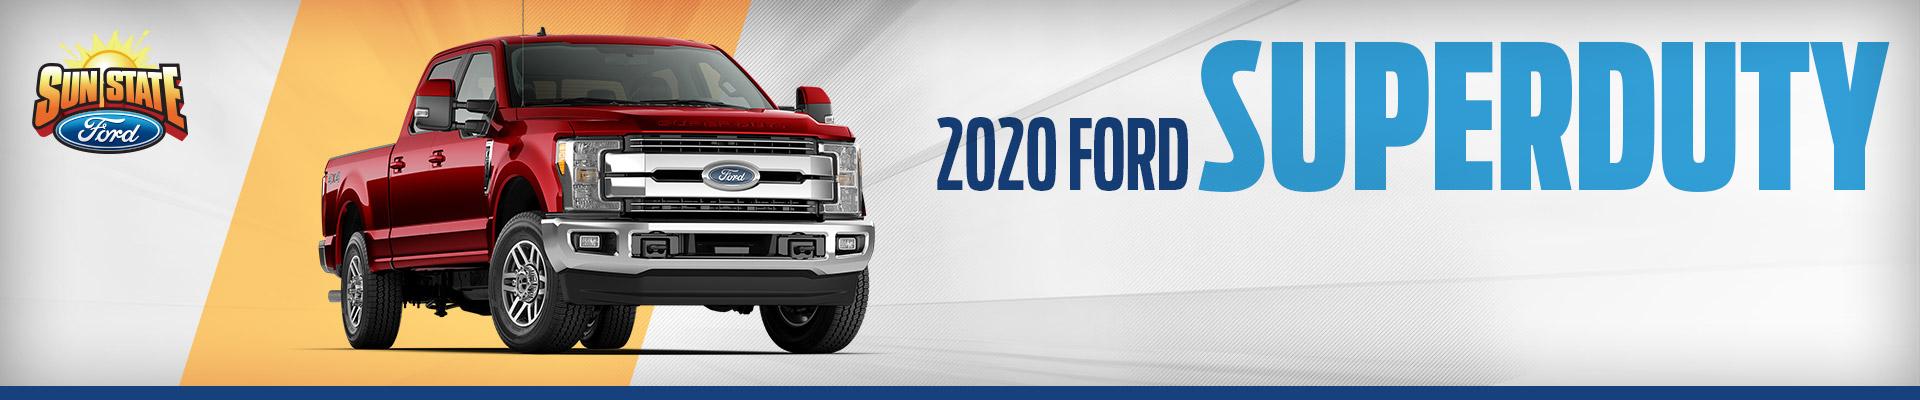 2020 Ford Super Duty - Sun State Ford - Orlando, FL